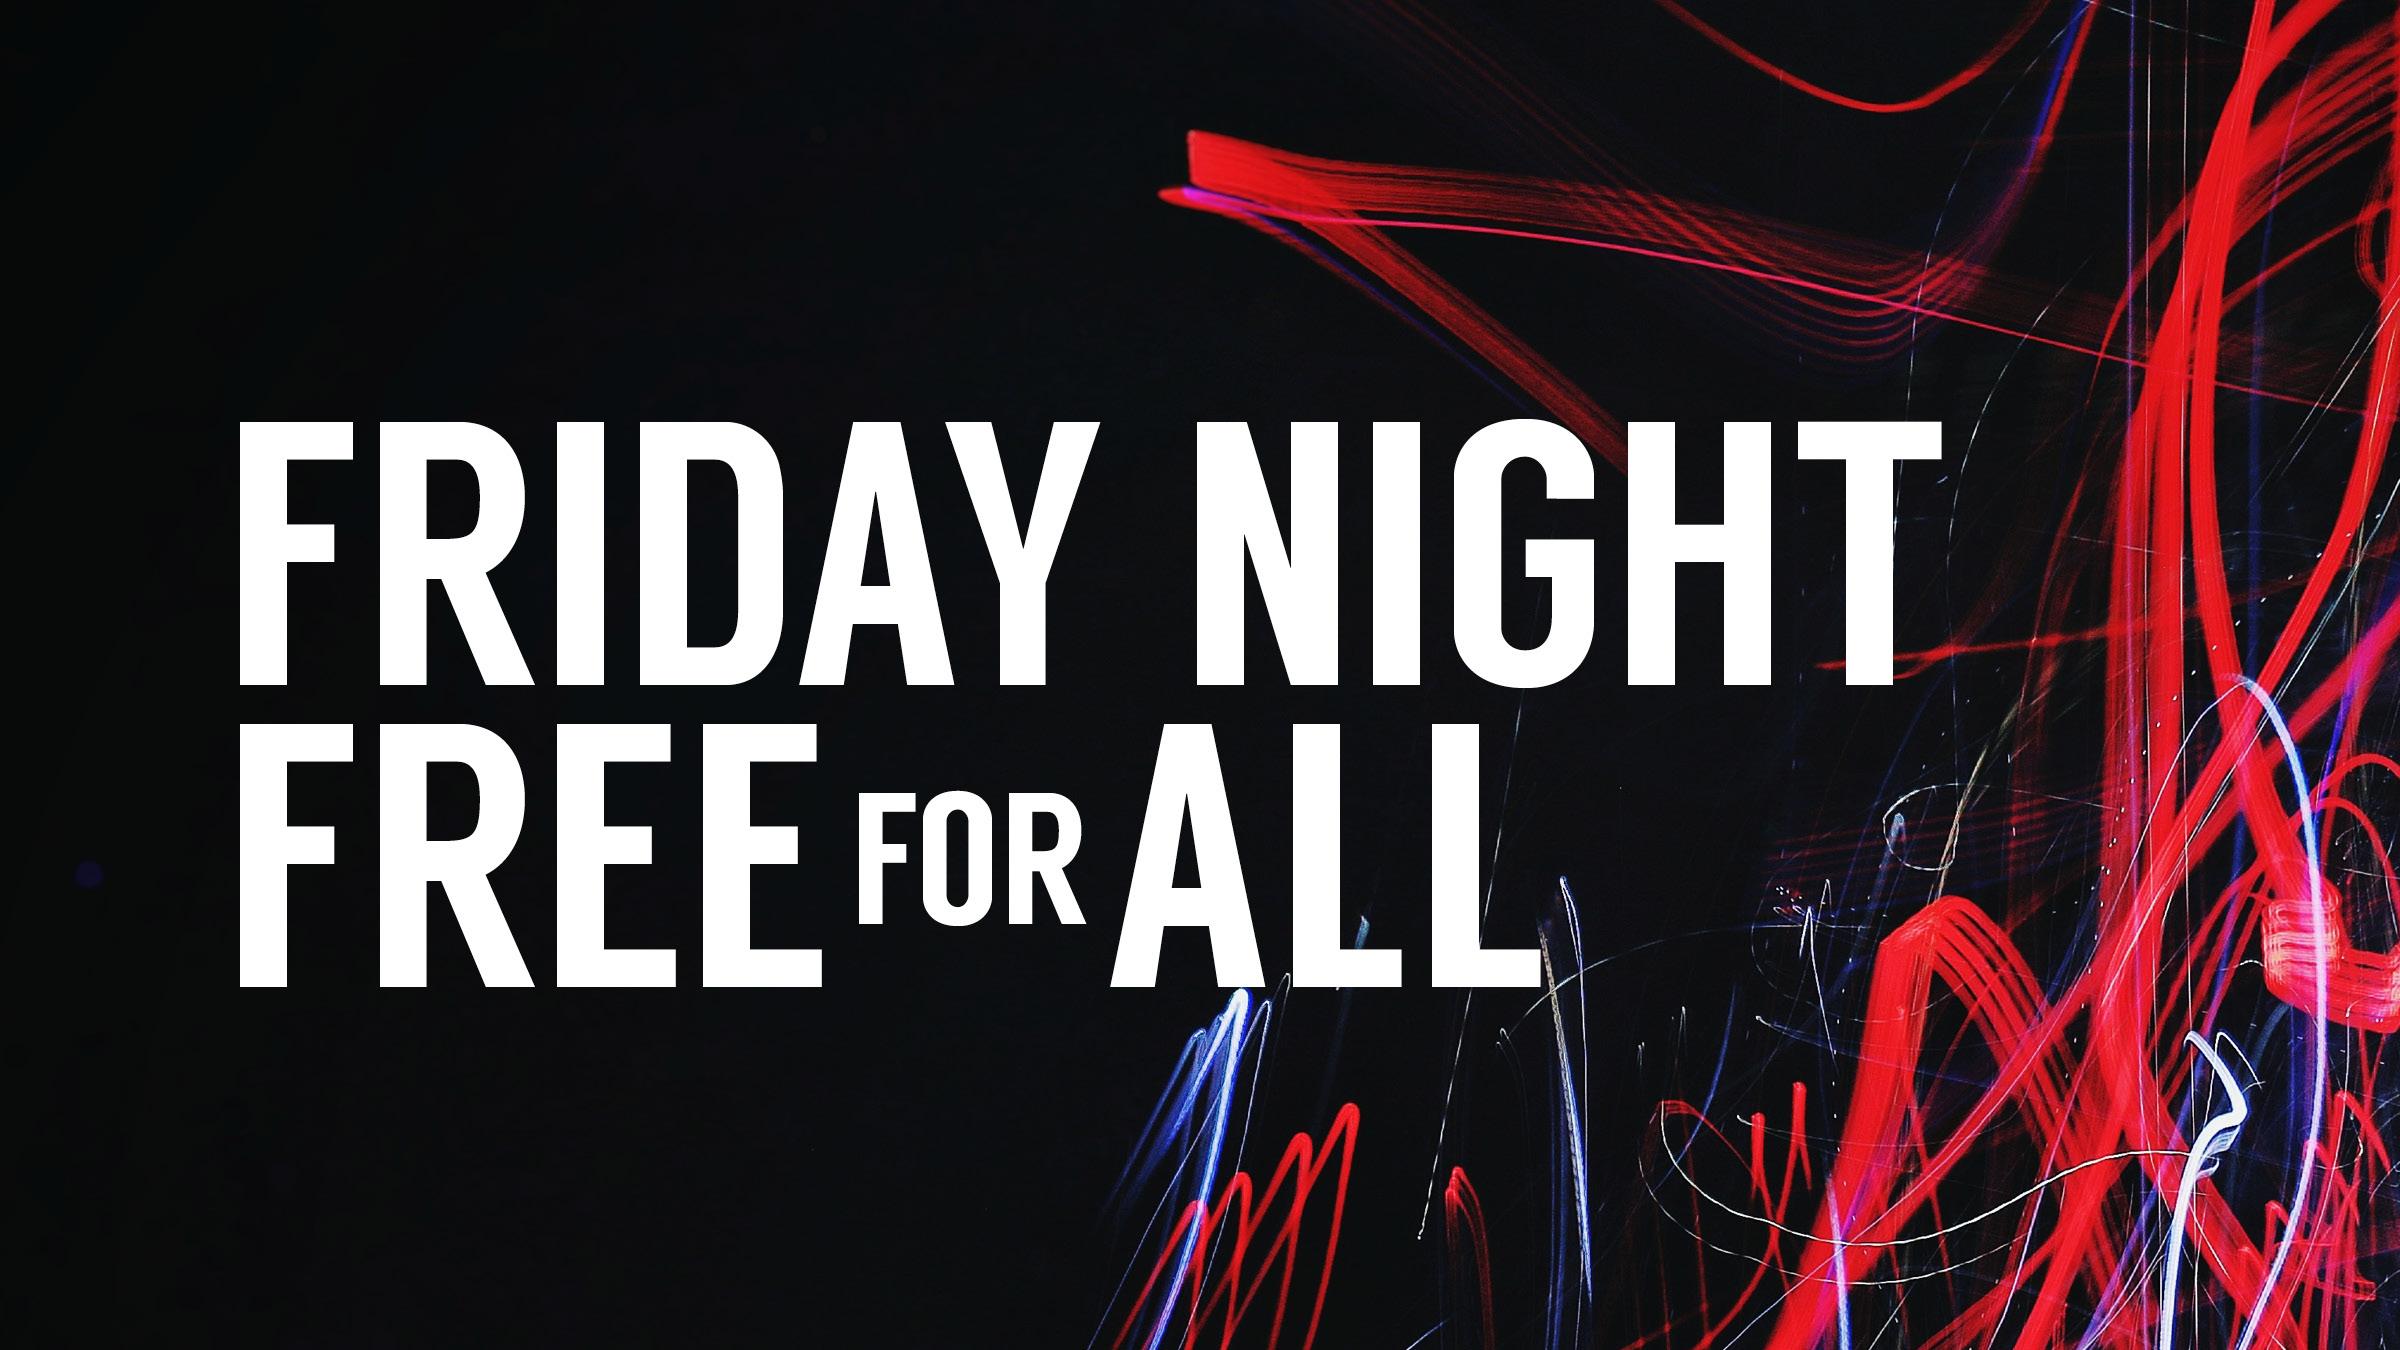 181011 friday night free for all v2.jpg